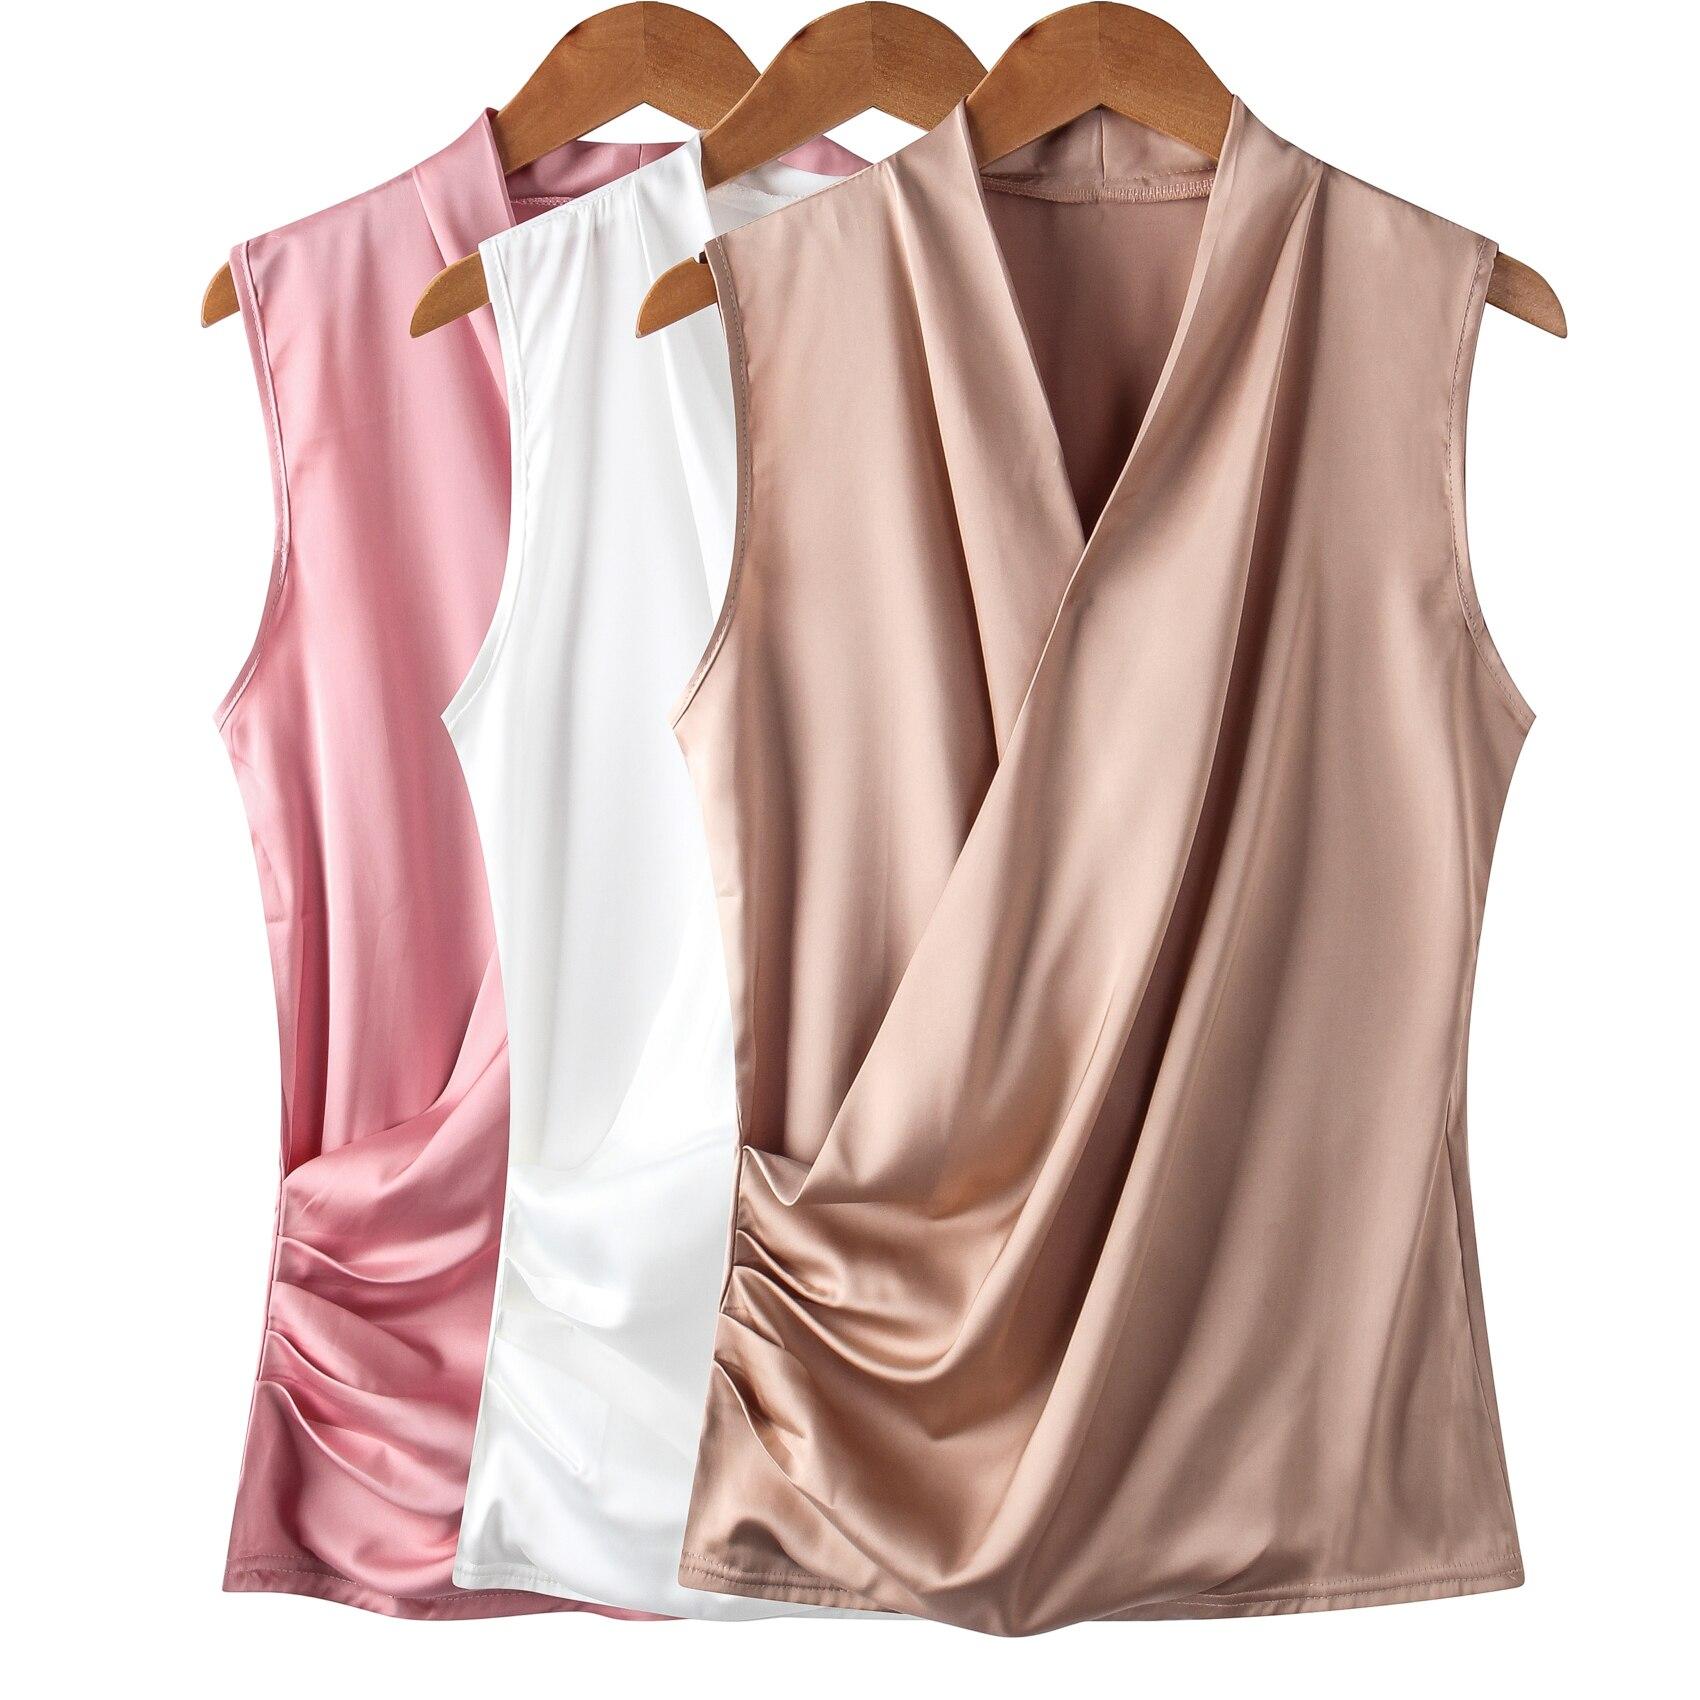 Korean Fashion Silk Office Lady Womens Tops And Blouses Stand Women Blouses Plus Size 4XL Blusas Femininas Elegante Ladies Tops